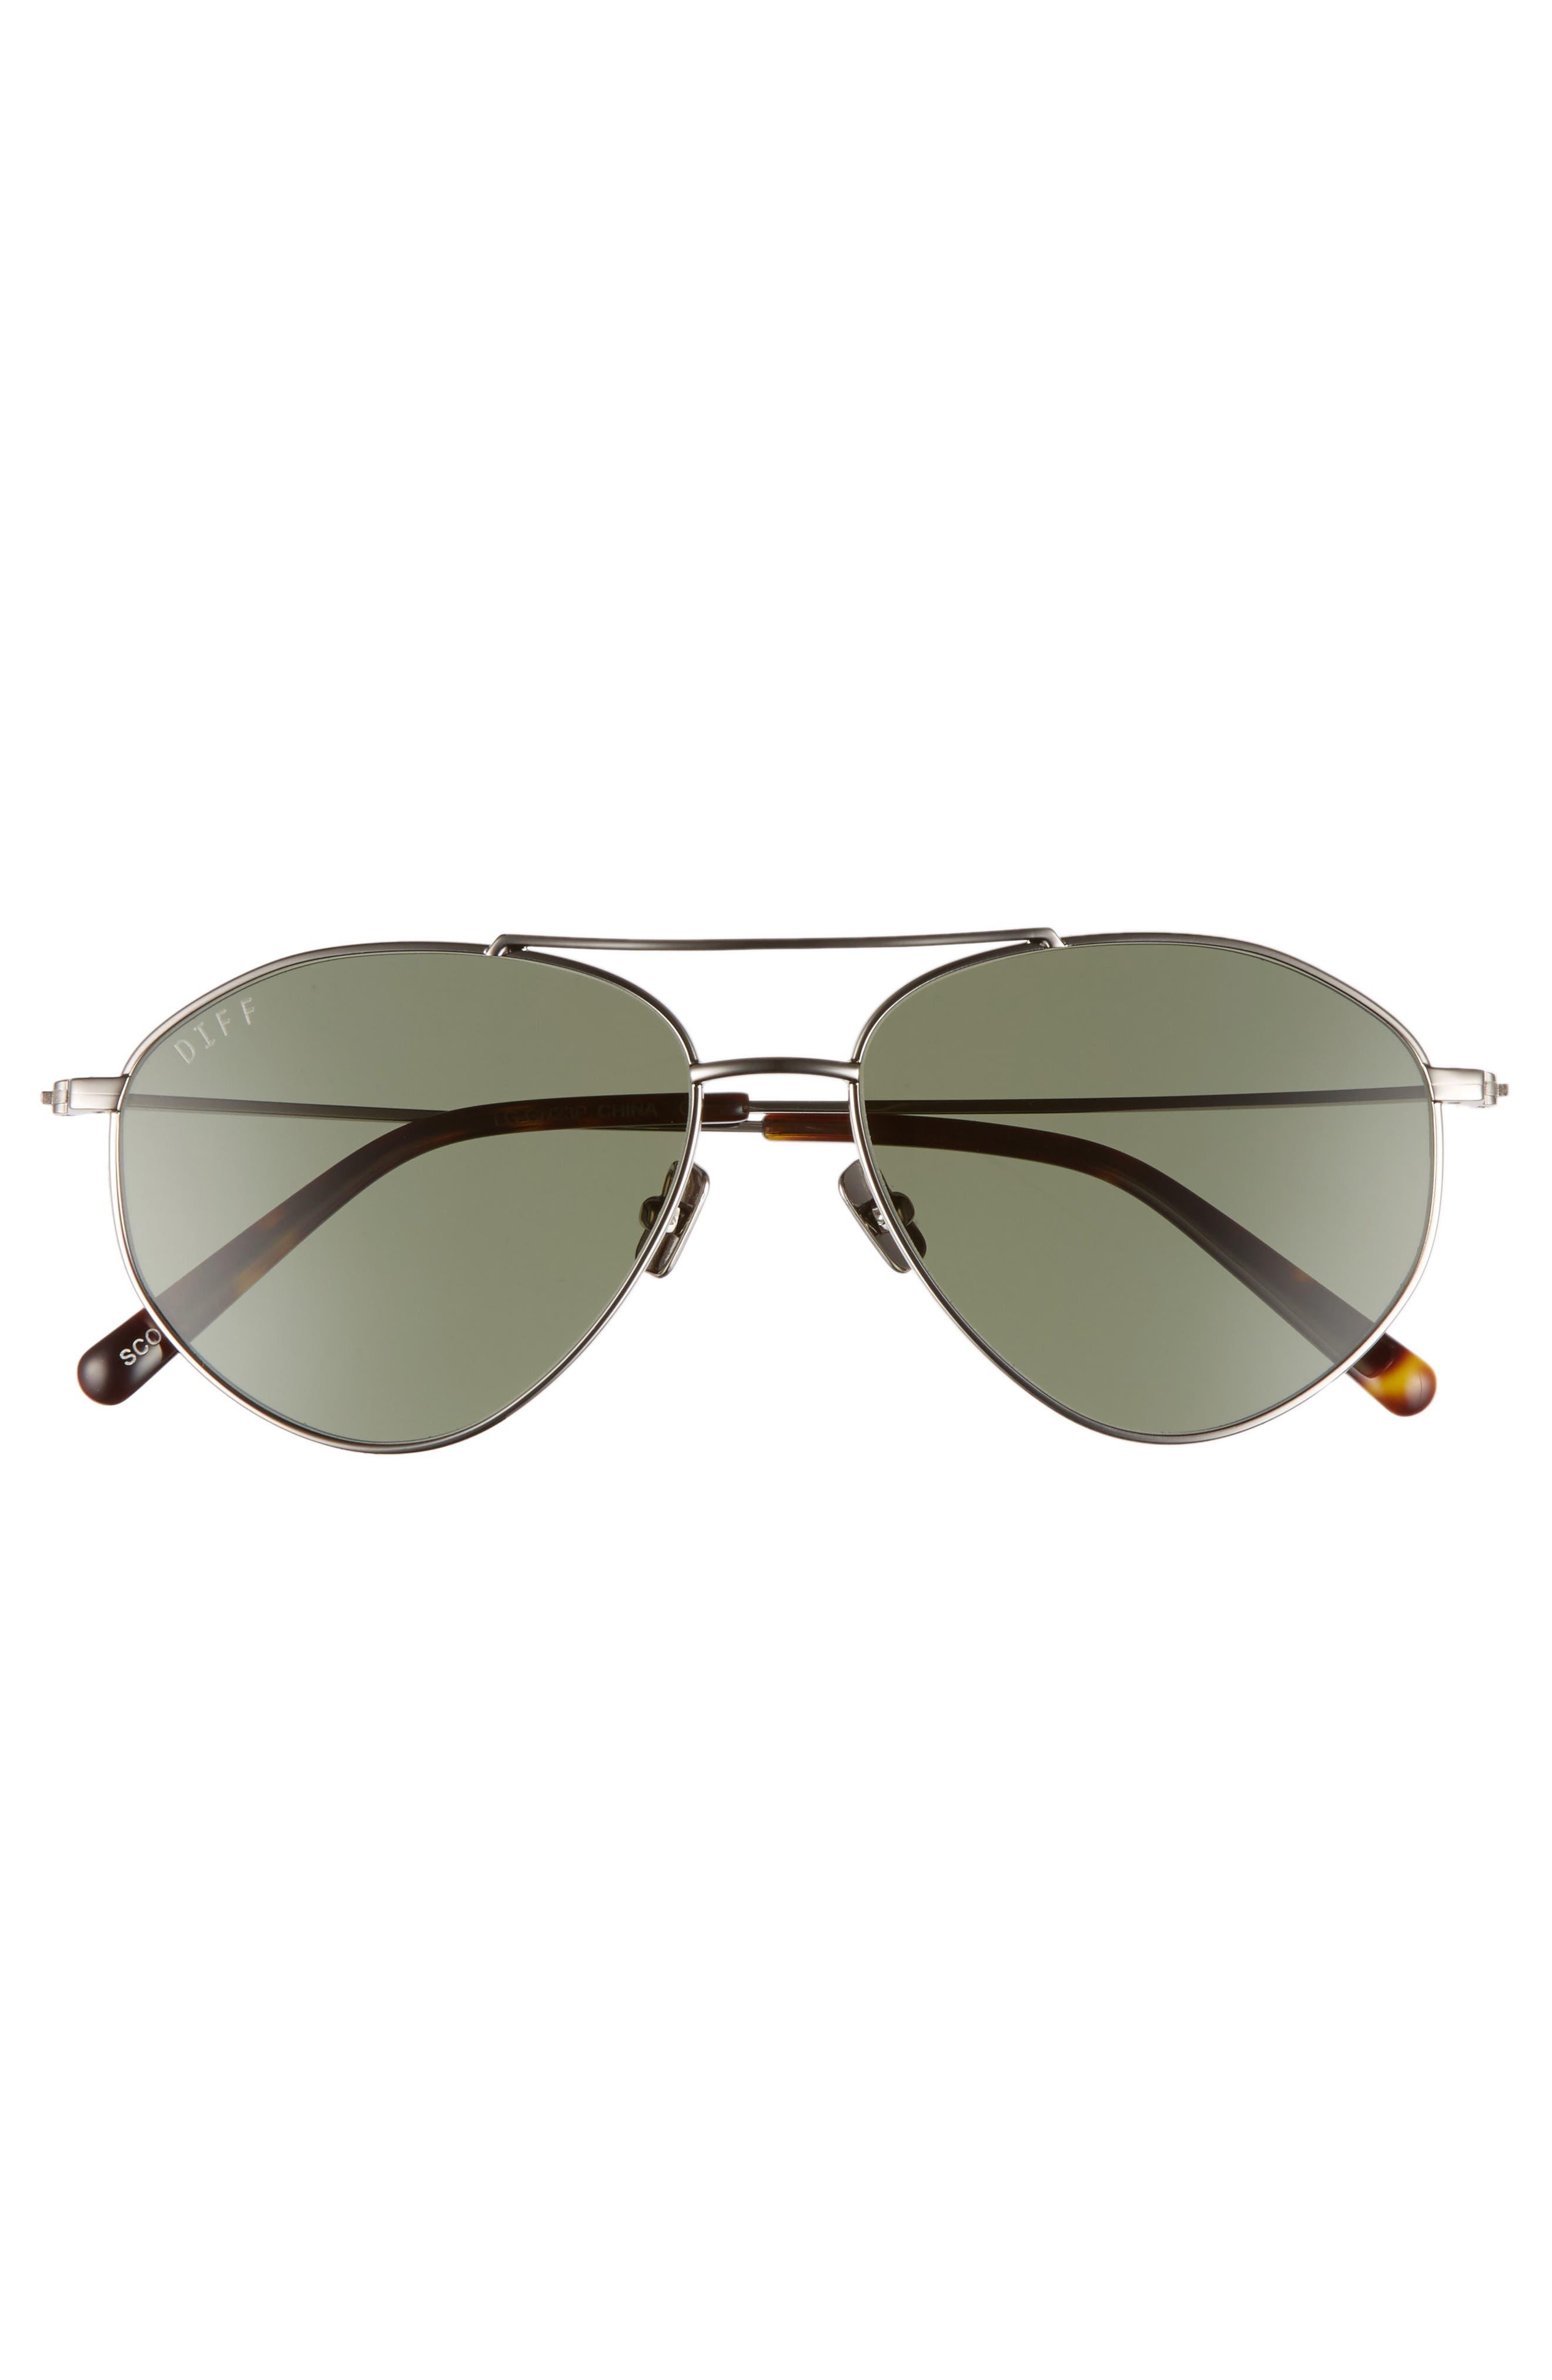 Scout 53mm Aviator Sunglasses,                             Alternate thumbnail 3, color,                             Light Gunmetal/ Green